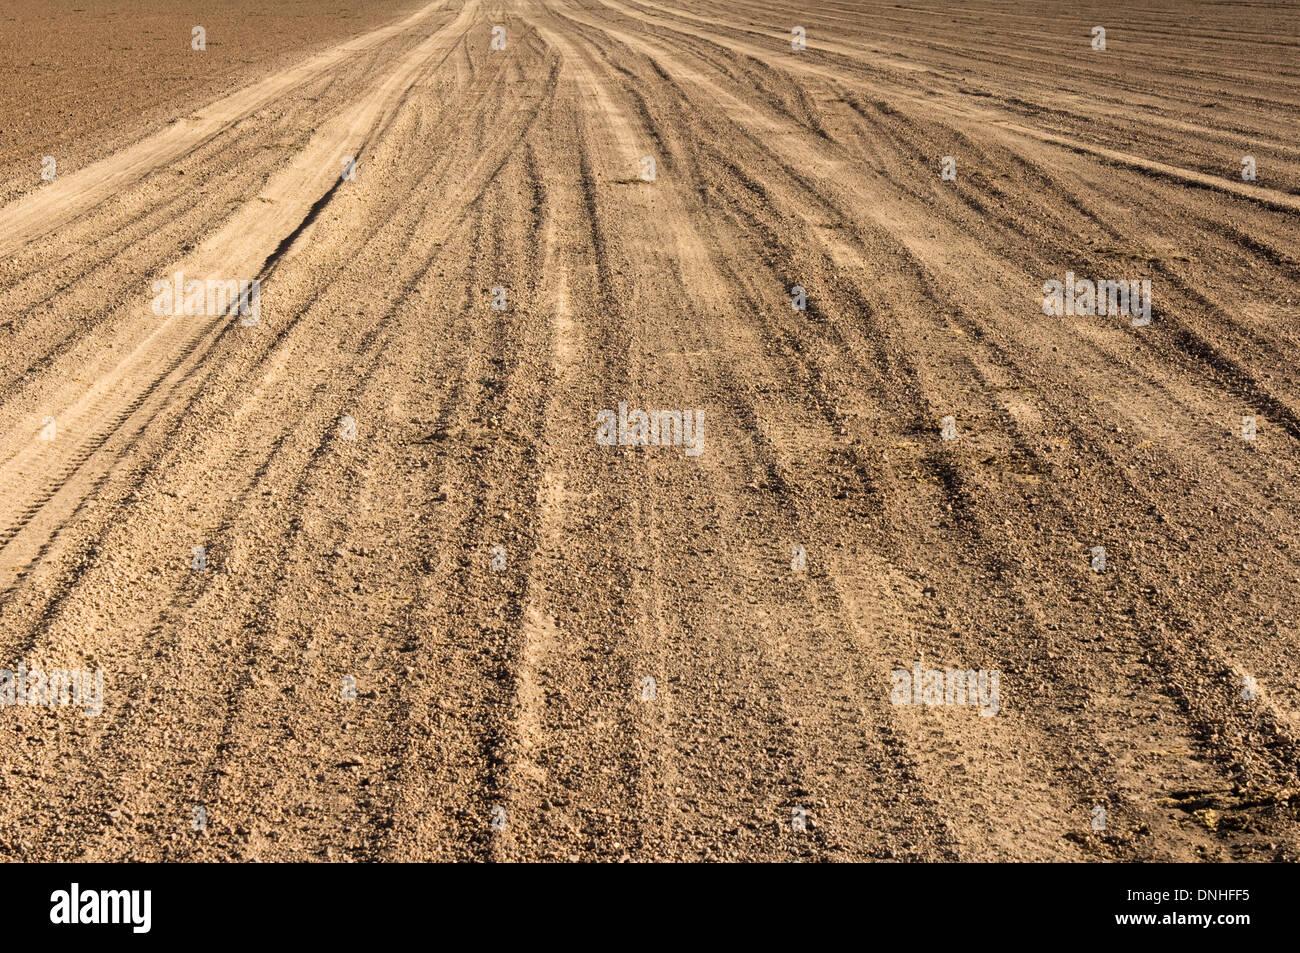 Wheel tracks, Altiplano, Potosi, Bolivia - Stock Image